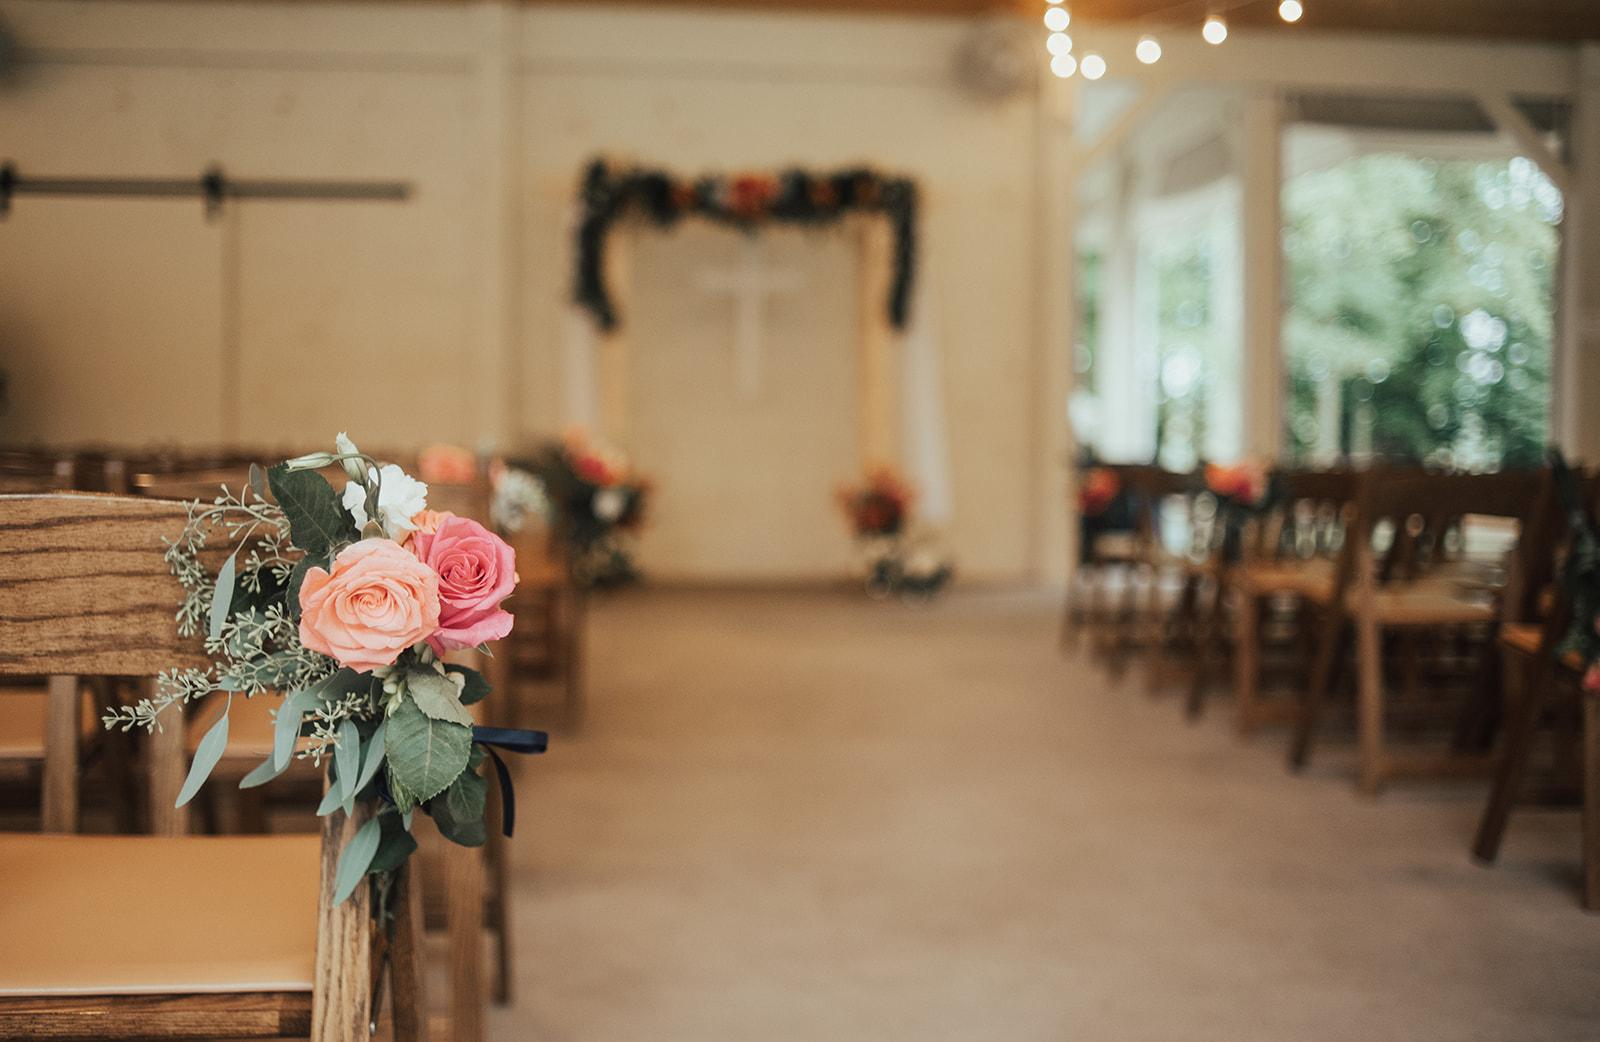 Richmond VA Wedding By SB Photographs154154154.jpg